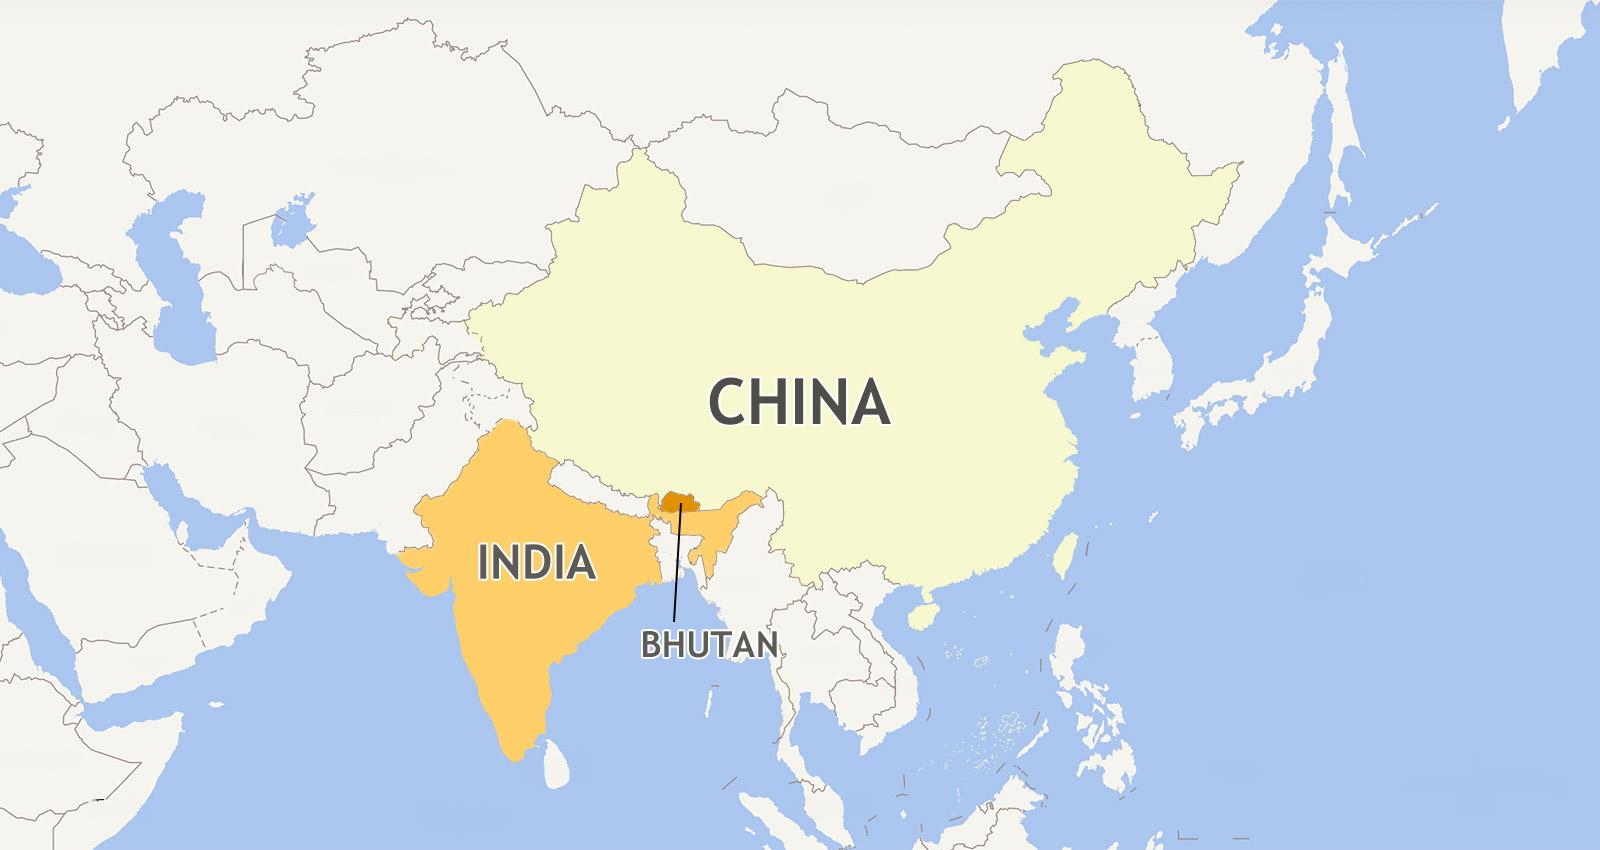 Bhutan Border Map/Bhutan Map with Surrounding Countries on india china boundary map, spain border map, india border changes, russia border map, australia border map, france border map, pakistan border map, western chinese border map,